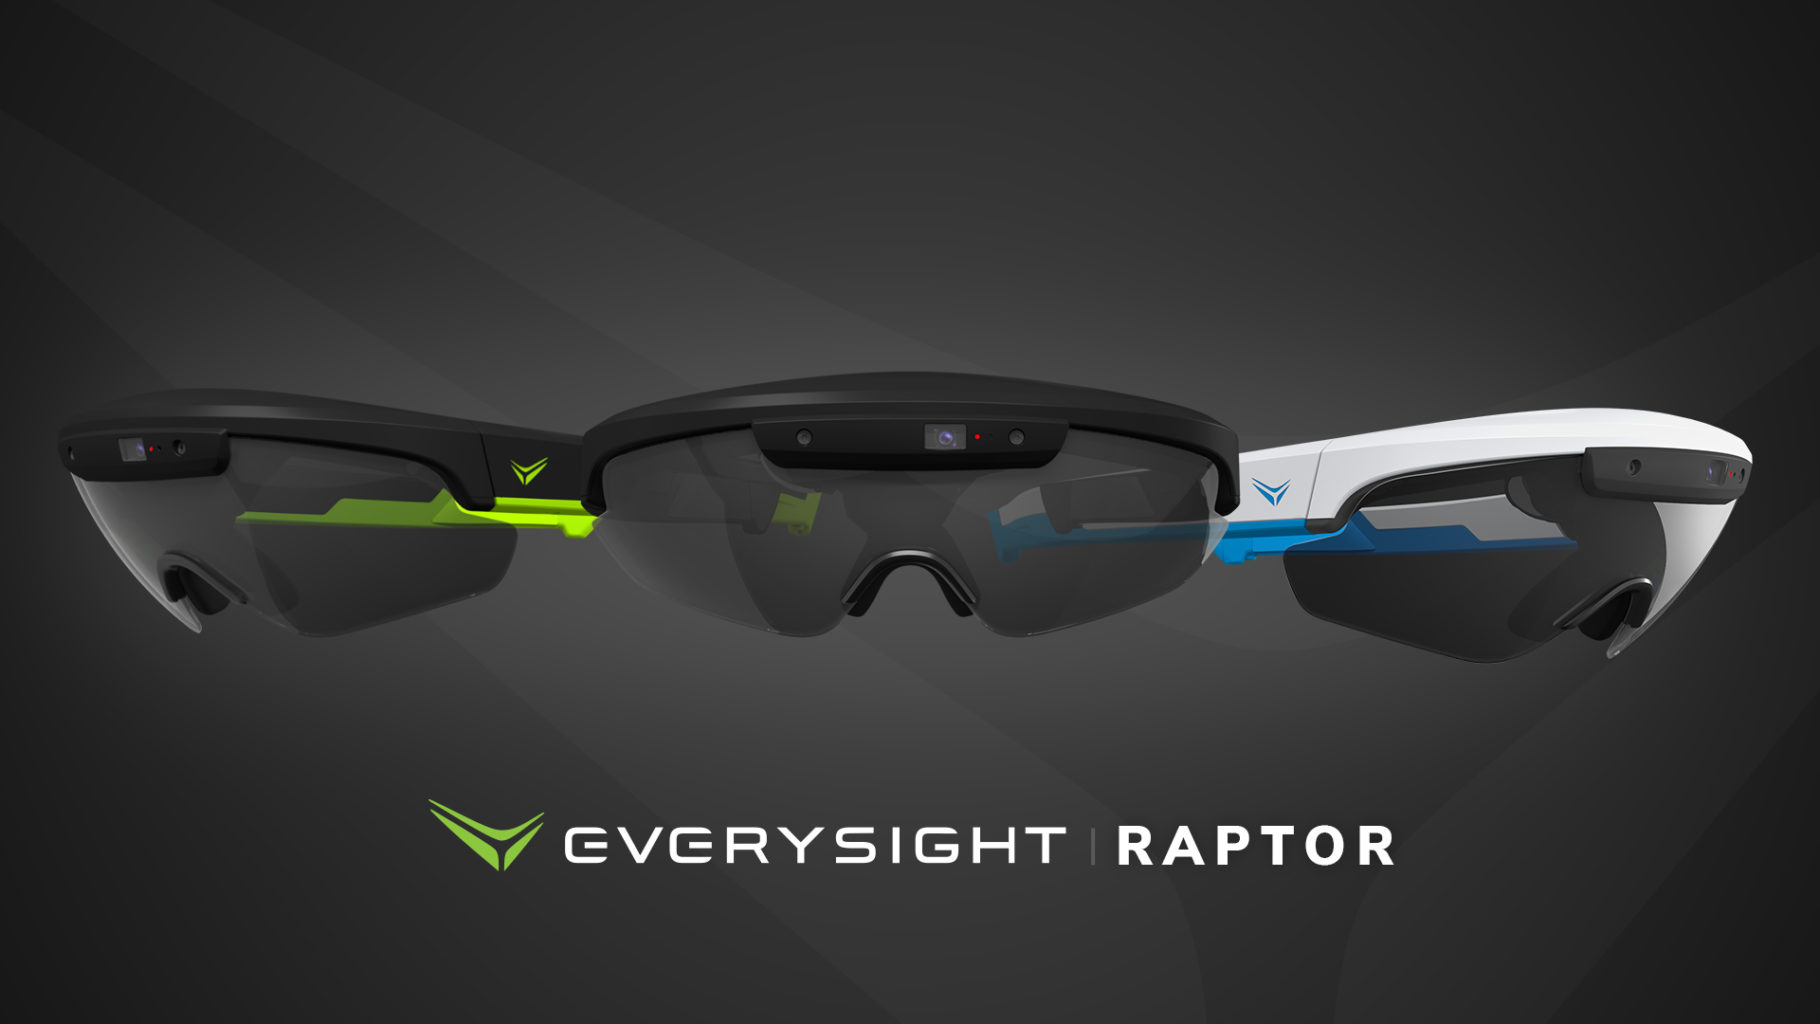 Everysight Raptor AR